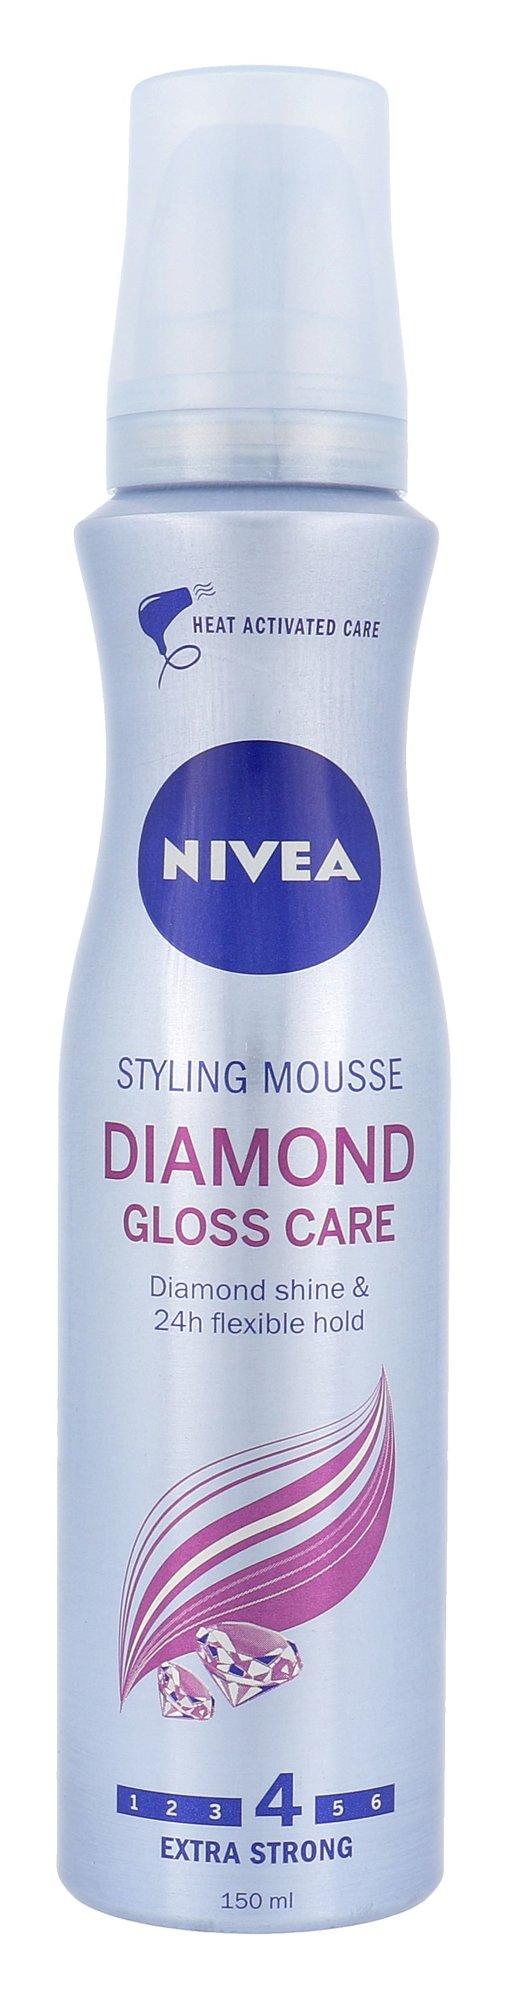 Nivea Diamond Gloss Care Cosmetic 150ml